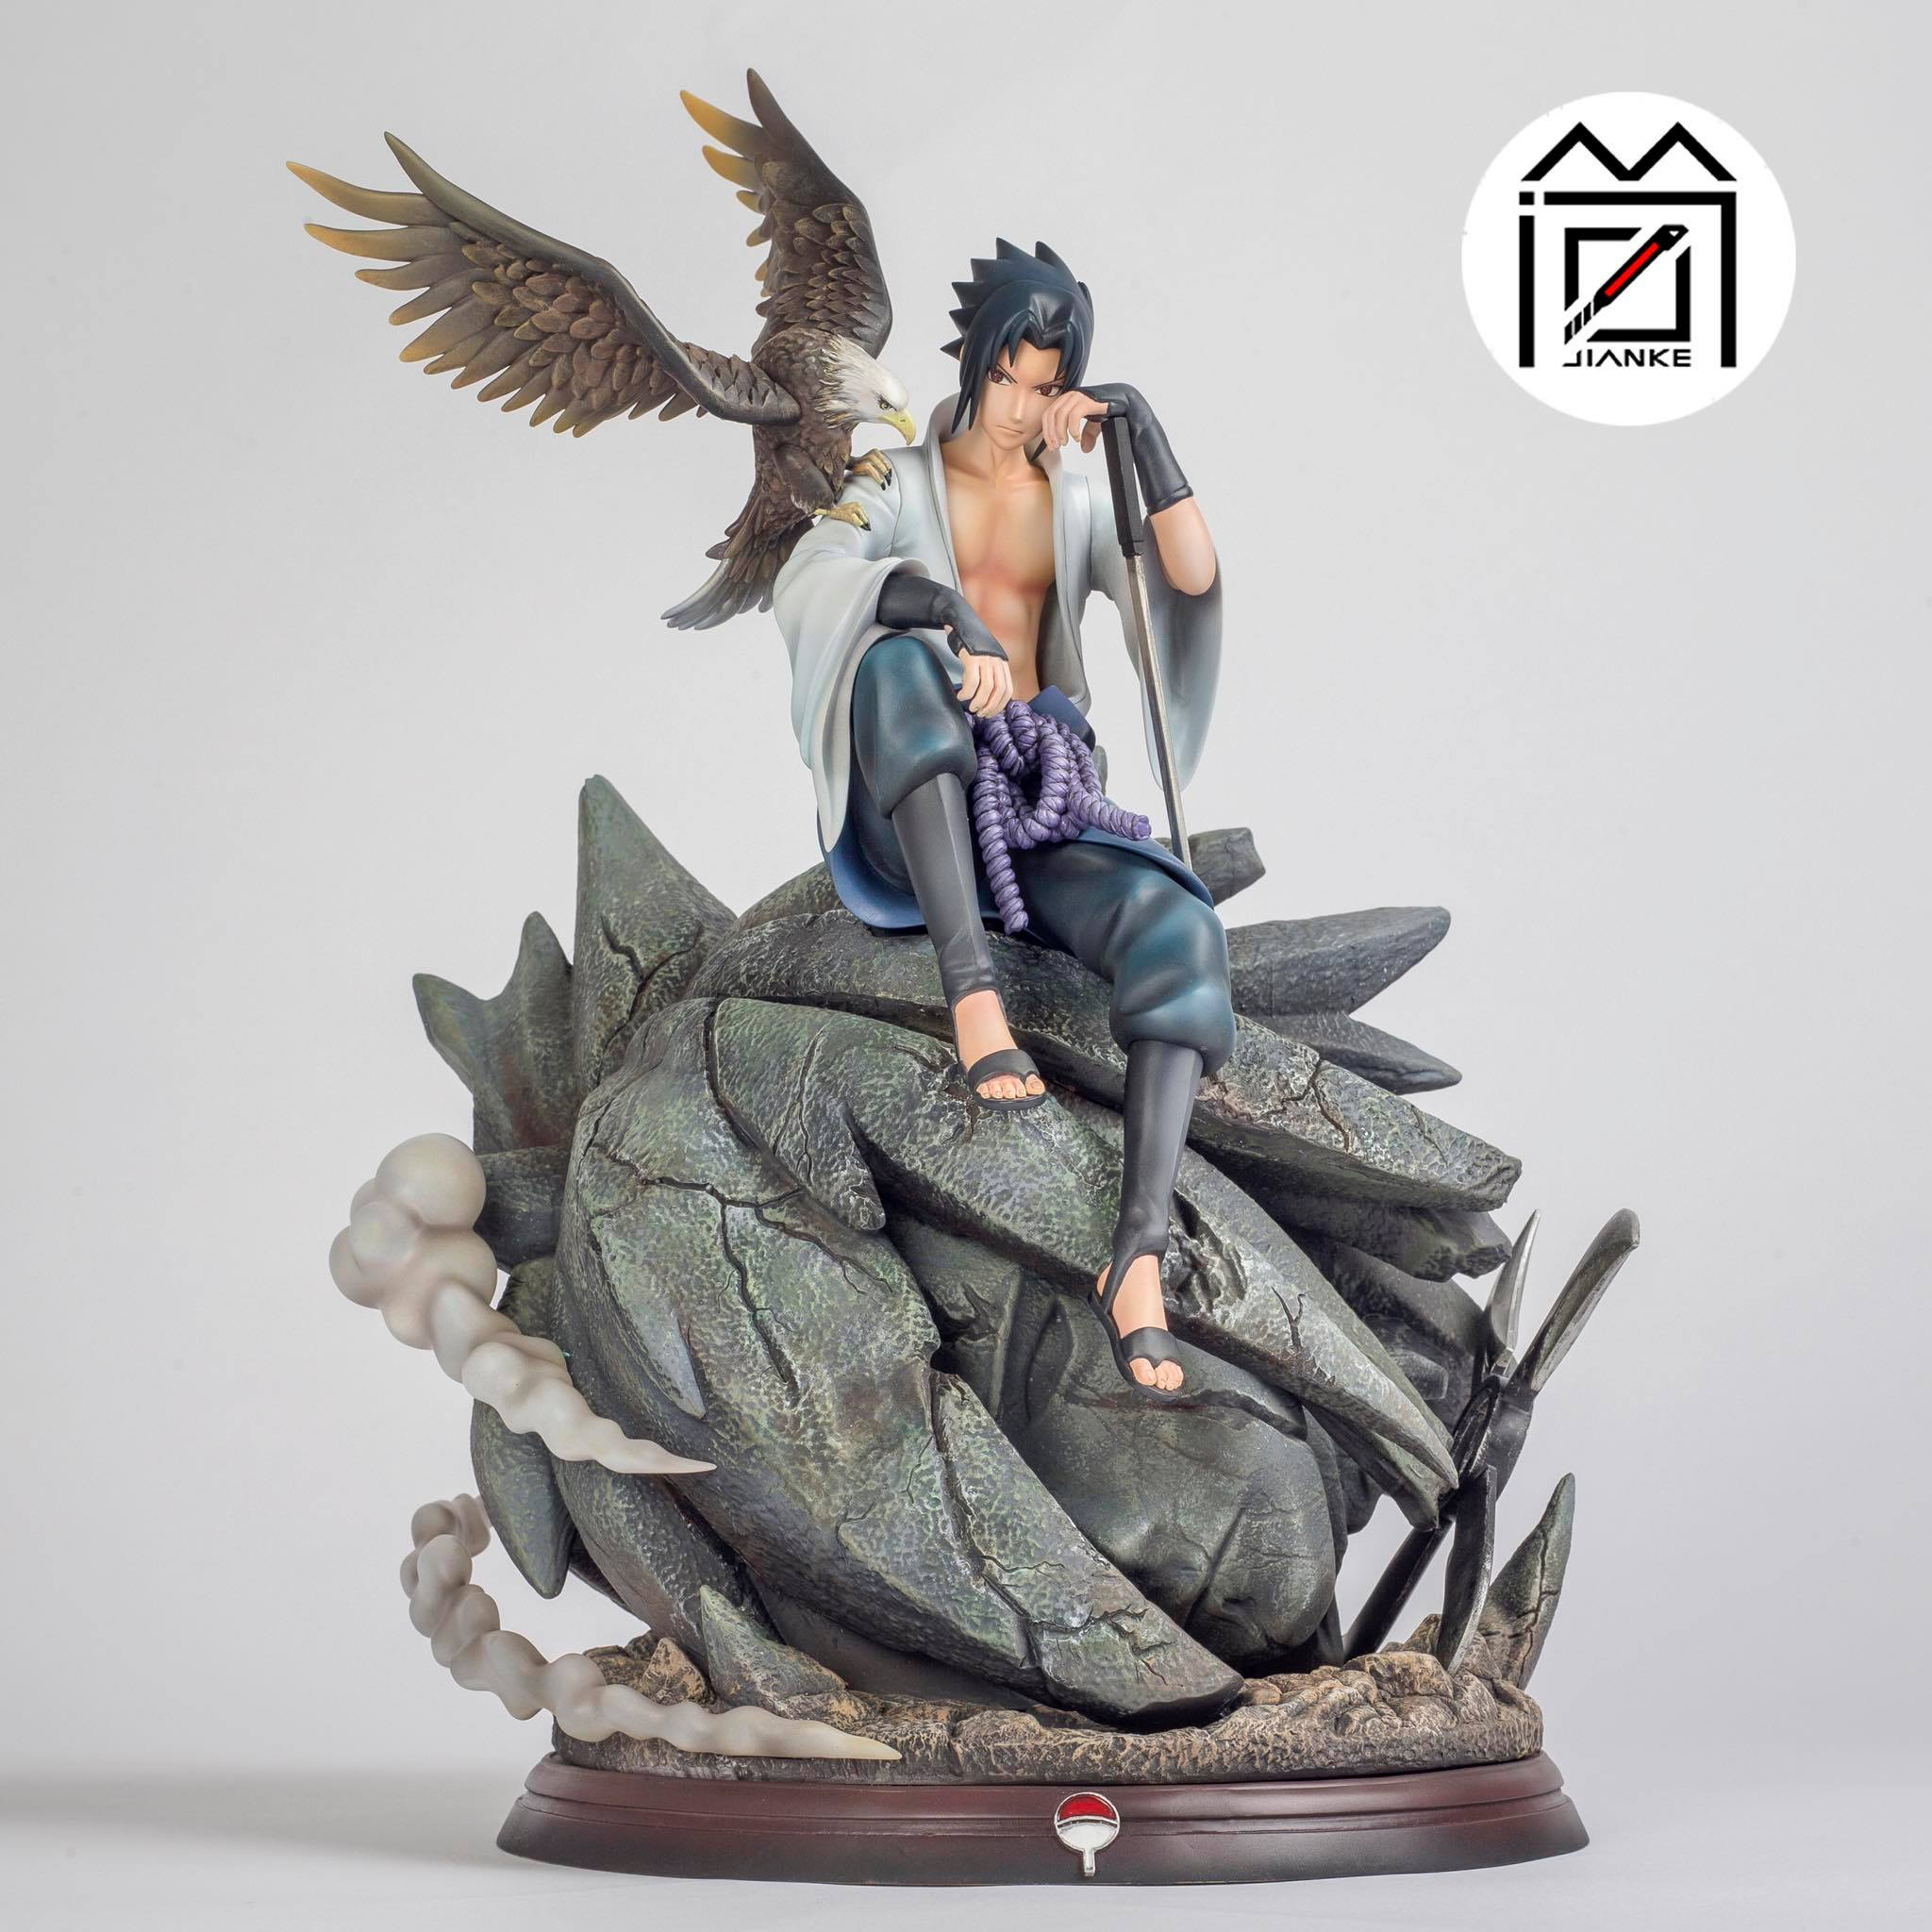 Sasuke Jianke Studio